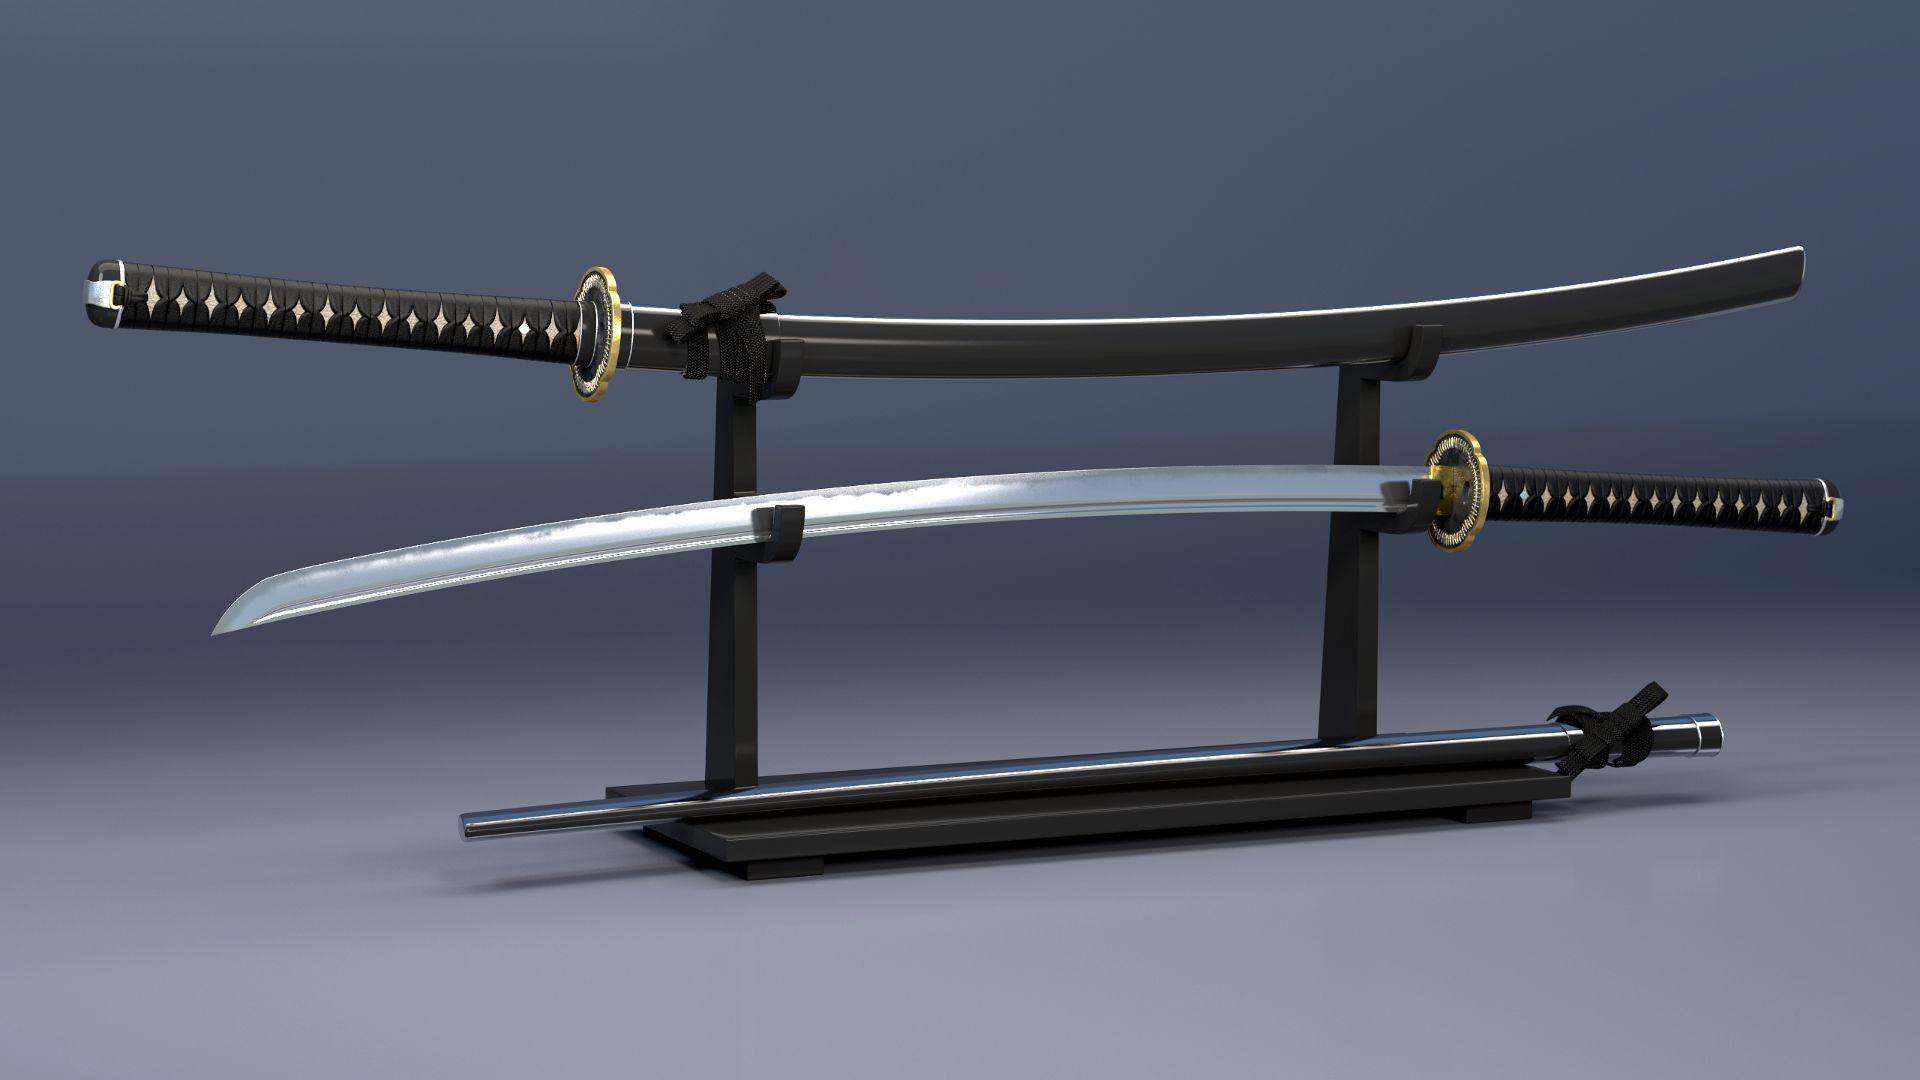 Sword full hd 1080p wallpaper